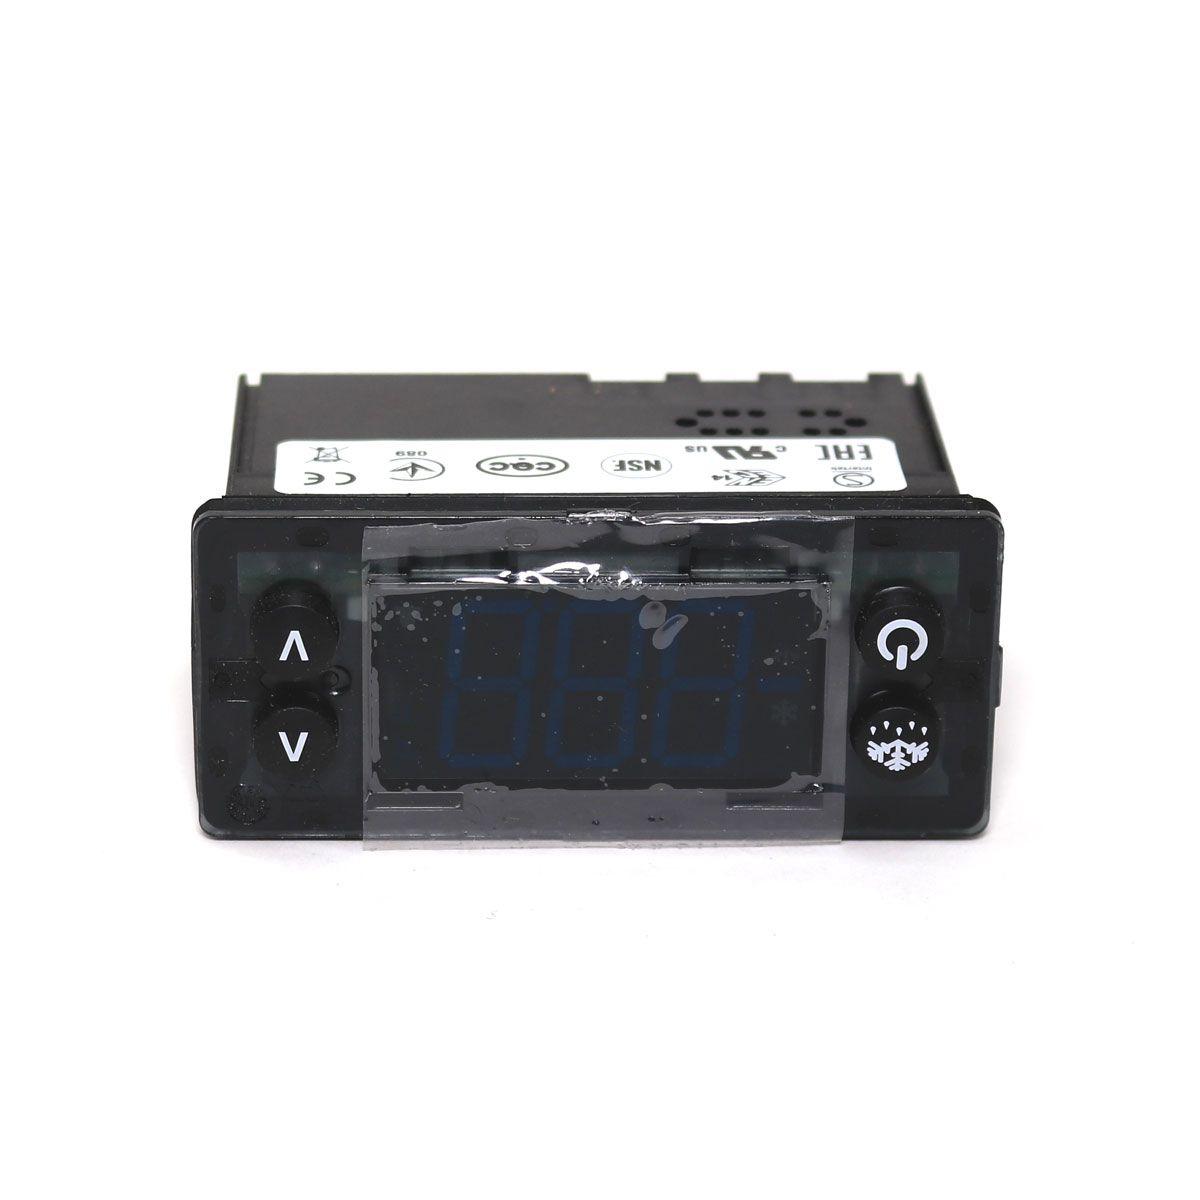 Controlador Digital Danfoss Erc 111a 100-240v